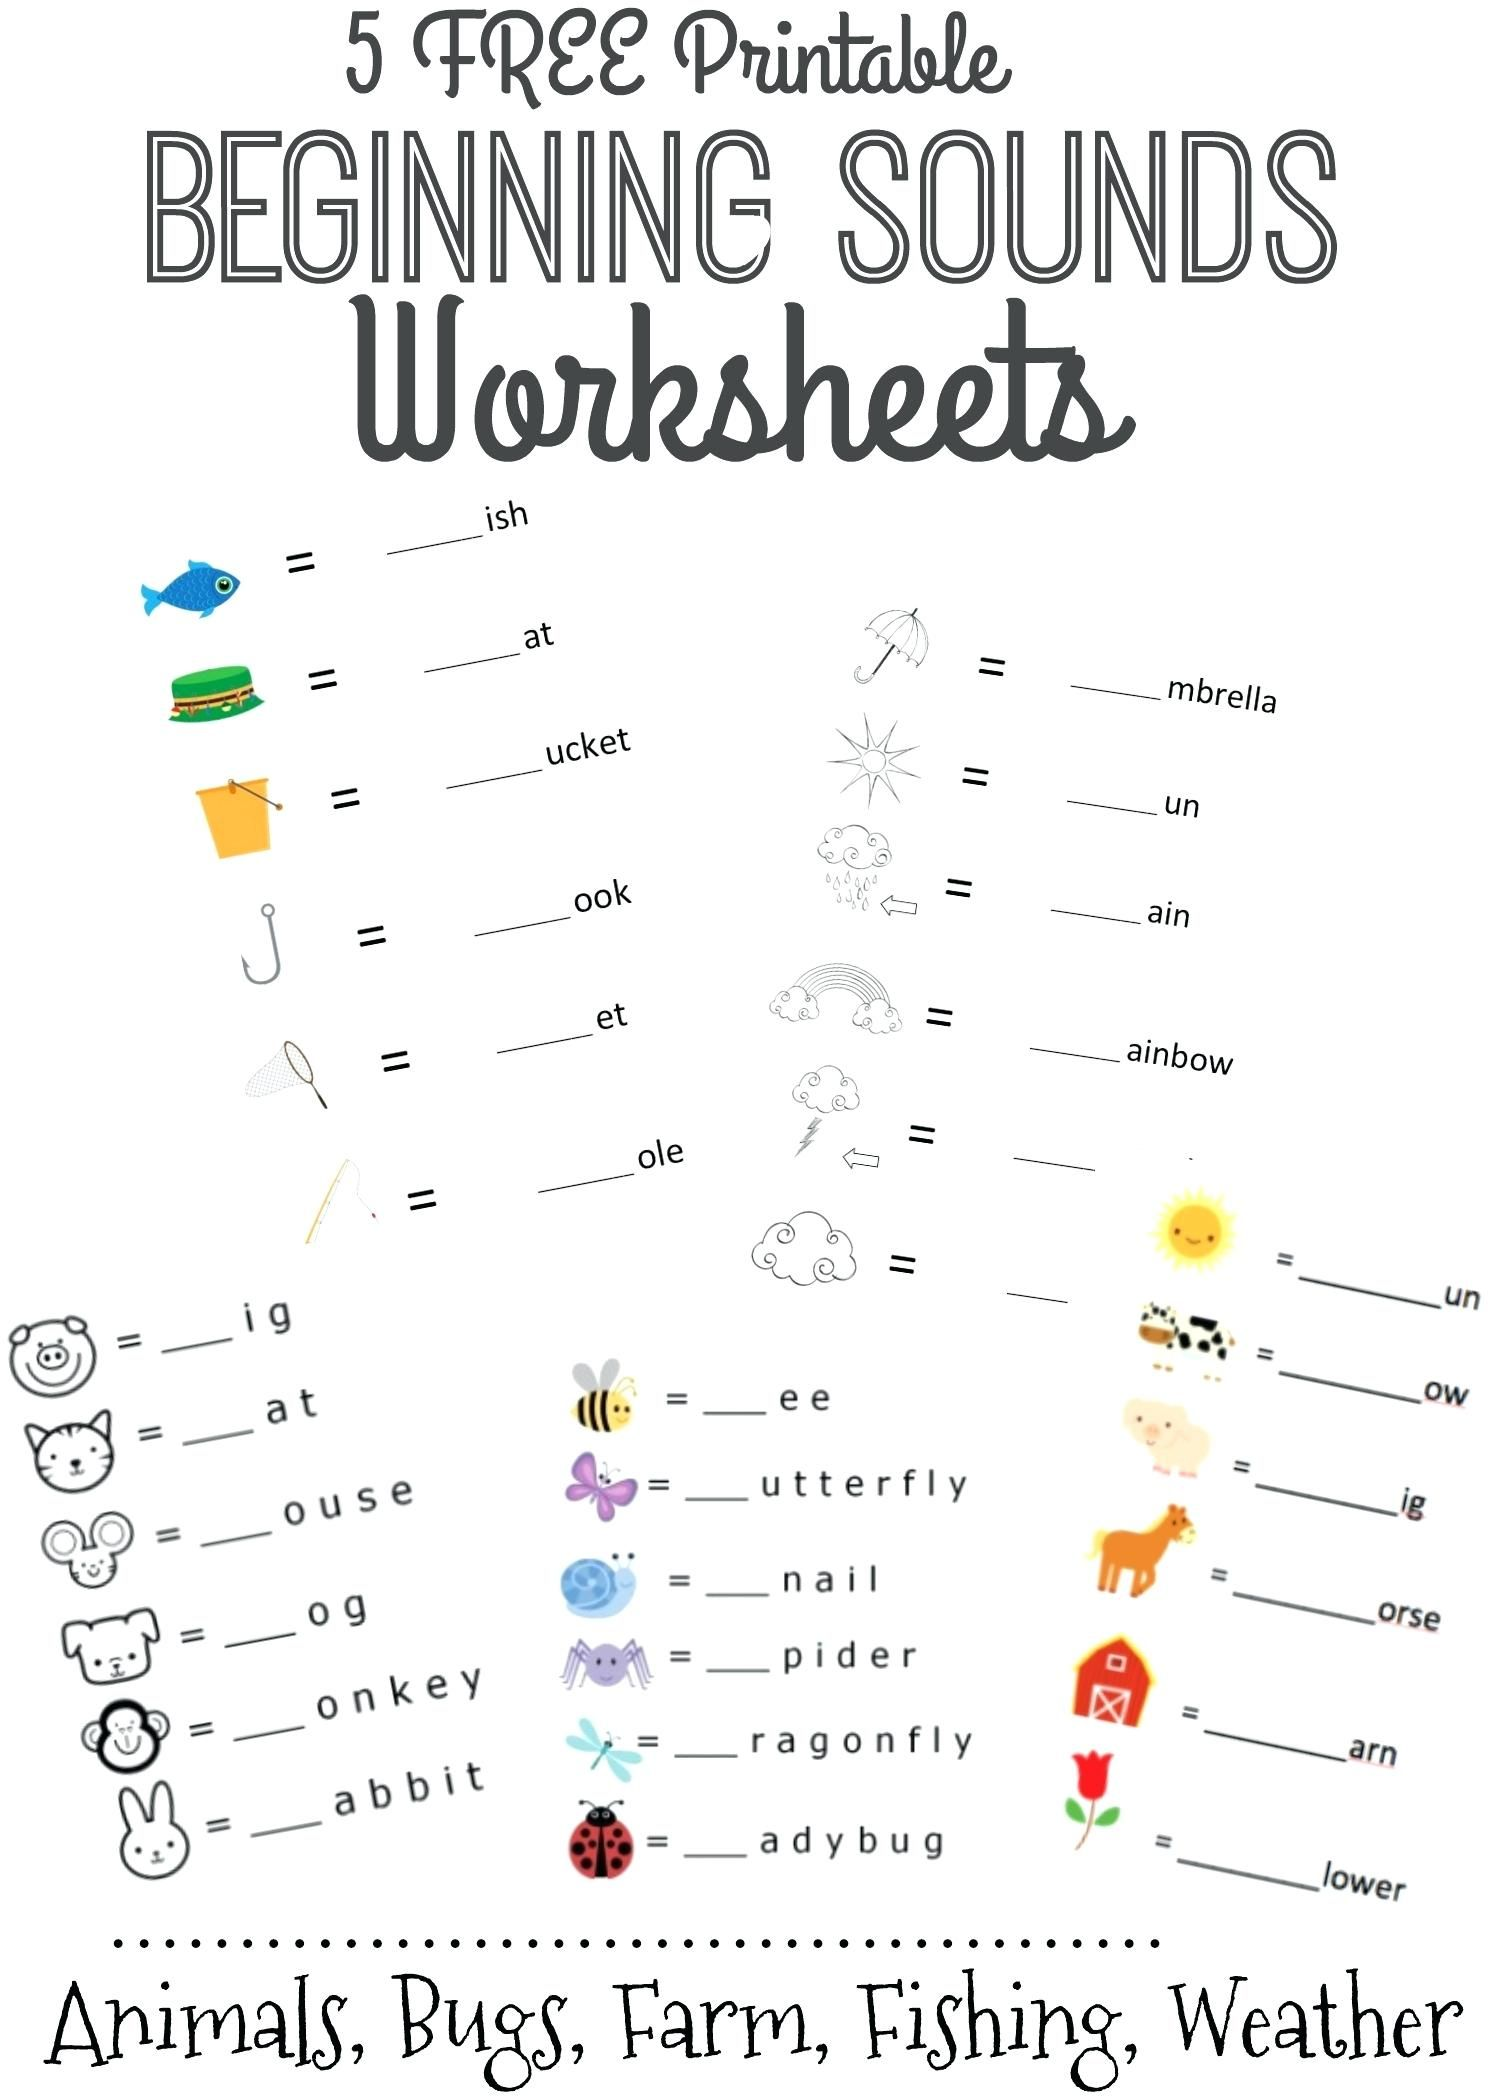 Worksheets Kindergarten Readiness Worksheets sign language printable worksheets asl pinterest preschool kindergarten activities printables